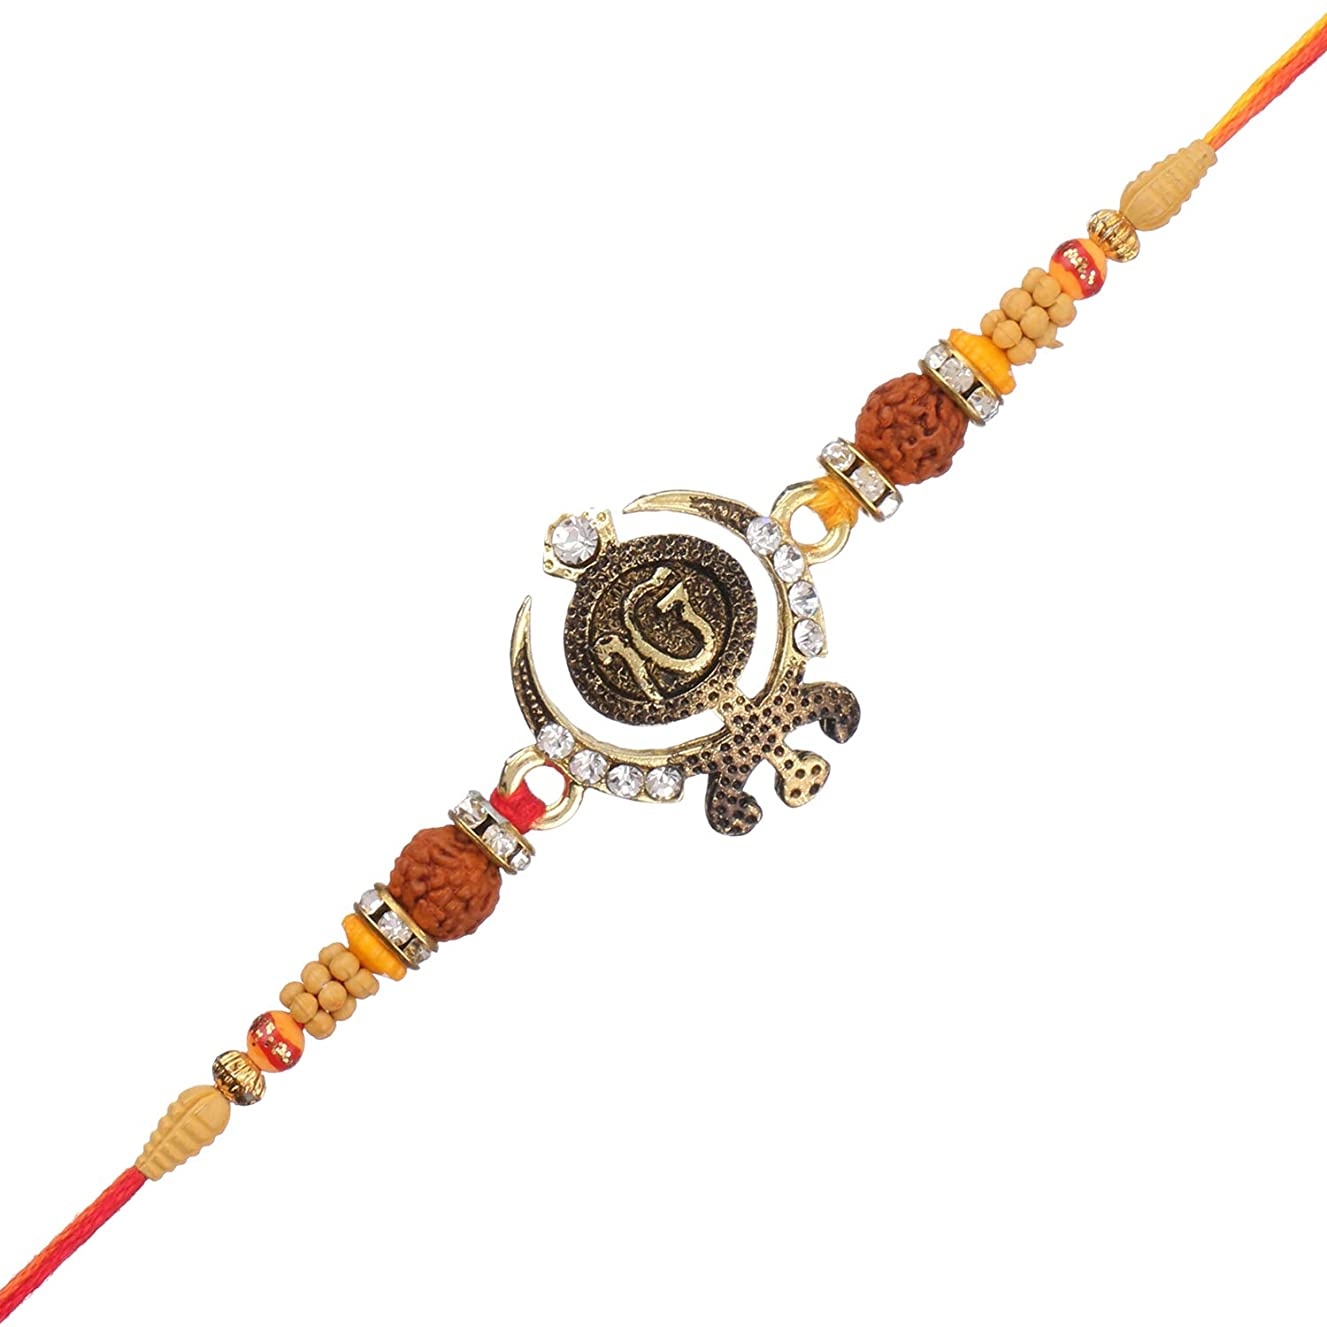 Raksha Bhandan Handmade Ik Onkar Rakhi Thread Bracelet with Stones Work Kundan Design Rakhi for Brother Bhaiya Celebration of Hindu Festival